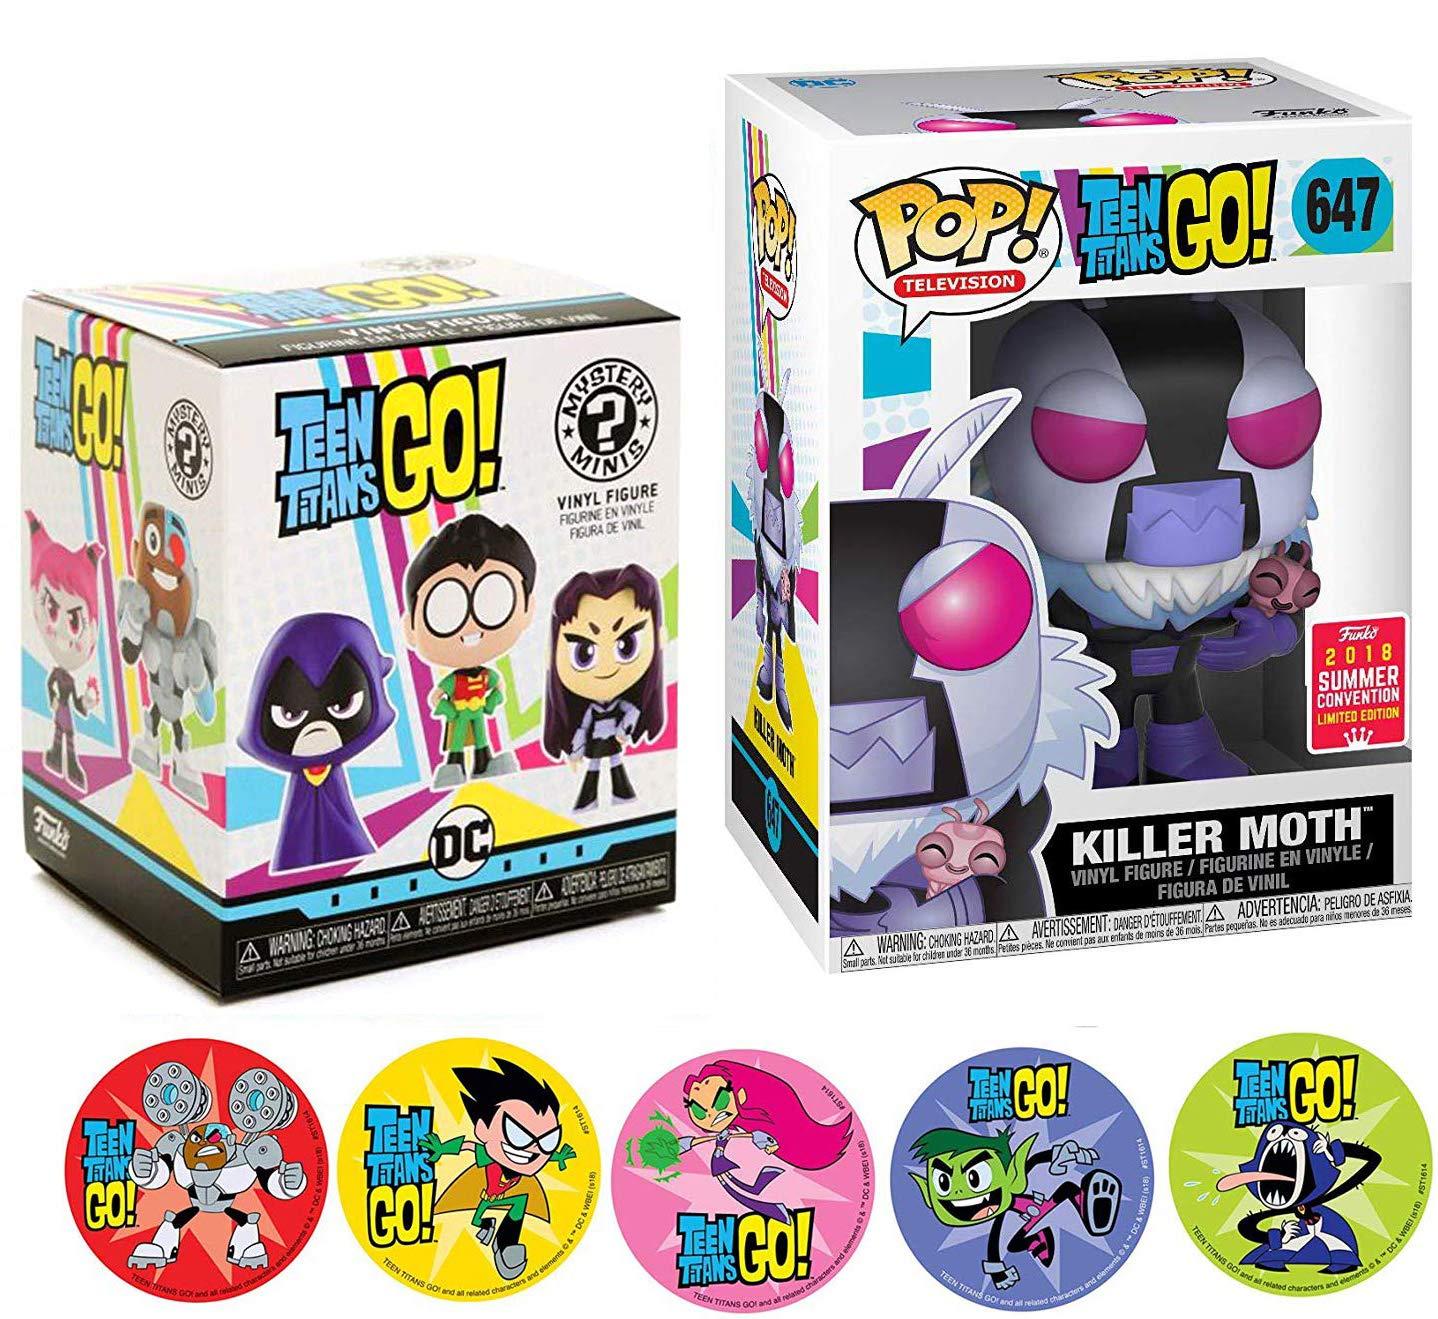 Beast Boy /& Cyborg 3 Items AYB Products Raven Starfire Robin Funko Vinyl Mini Titans Go Character Teen Titans Killer Moth Figure /& Blind Box Series Adventure Cartoon Toy Super Pop Exclusive Action Stickers